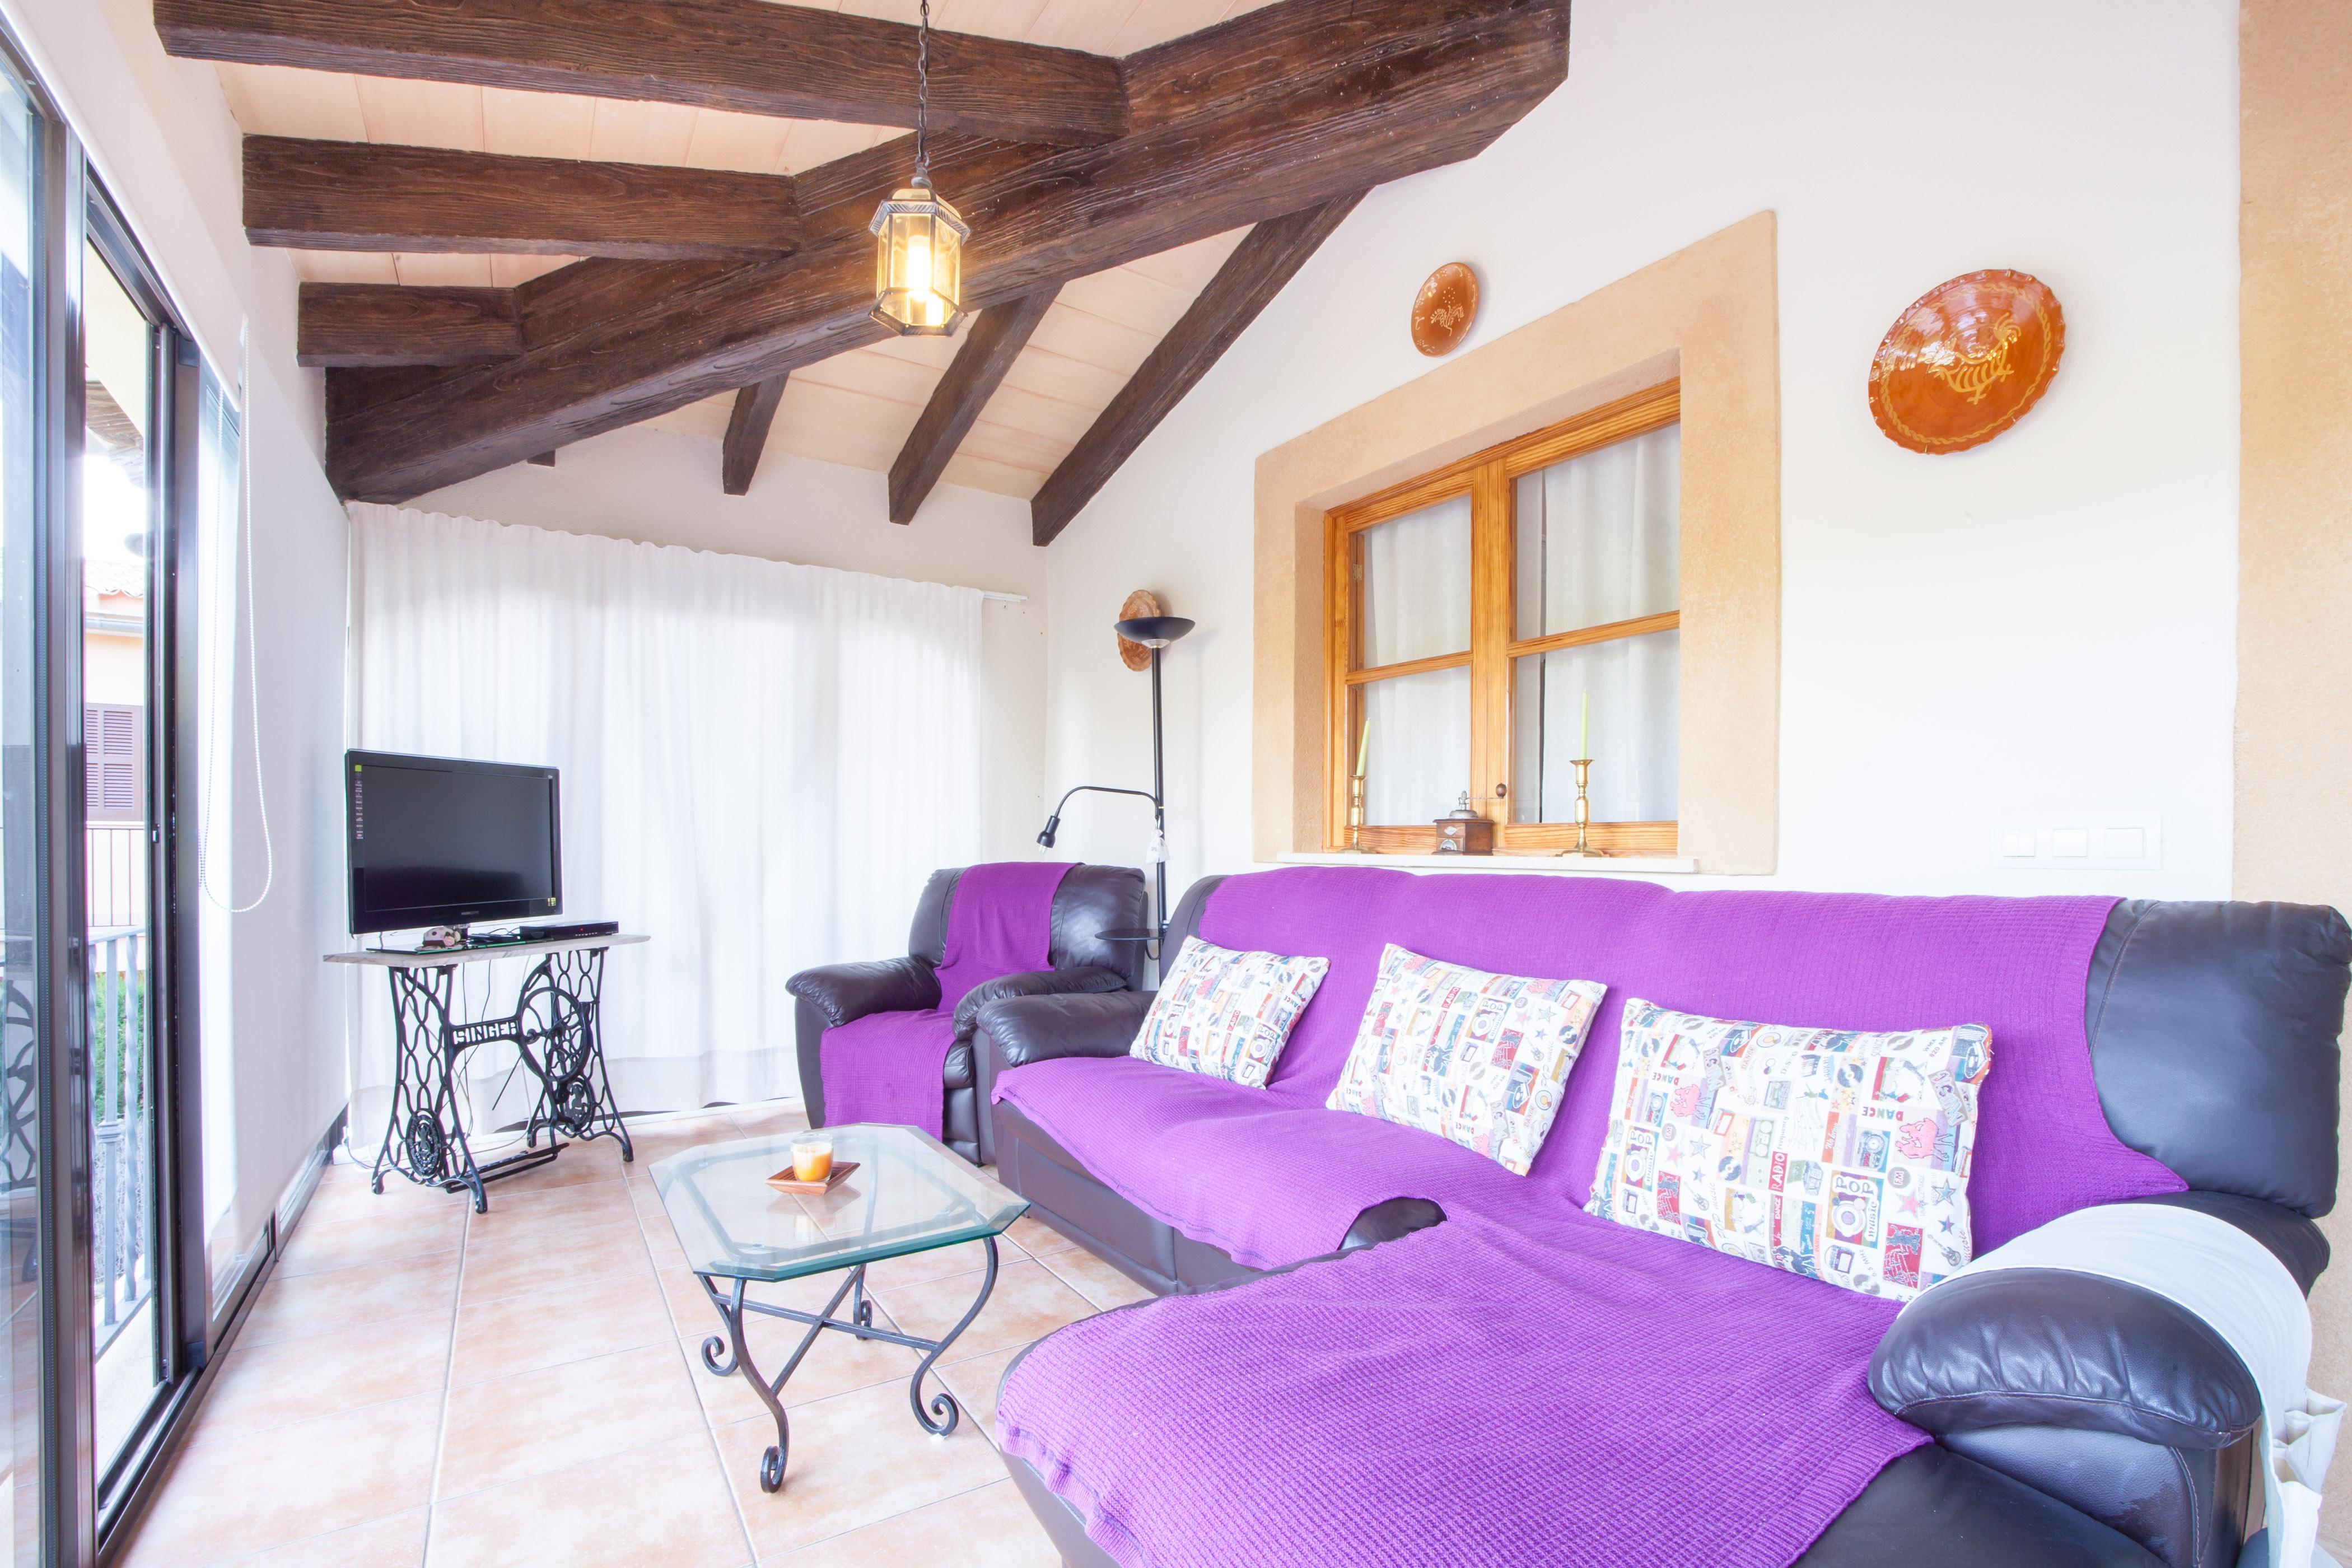 Ferienhaus SA TANCA (MANCORINA) (2037553), Mancor de la Vall, Mallorca, Balearische Inseln, Spanien, Bild 12